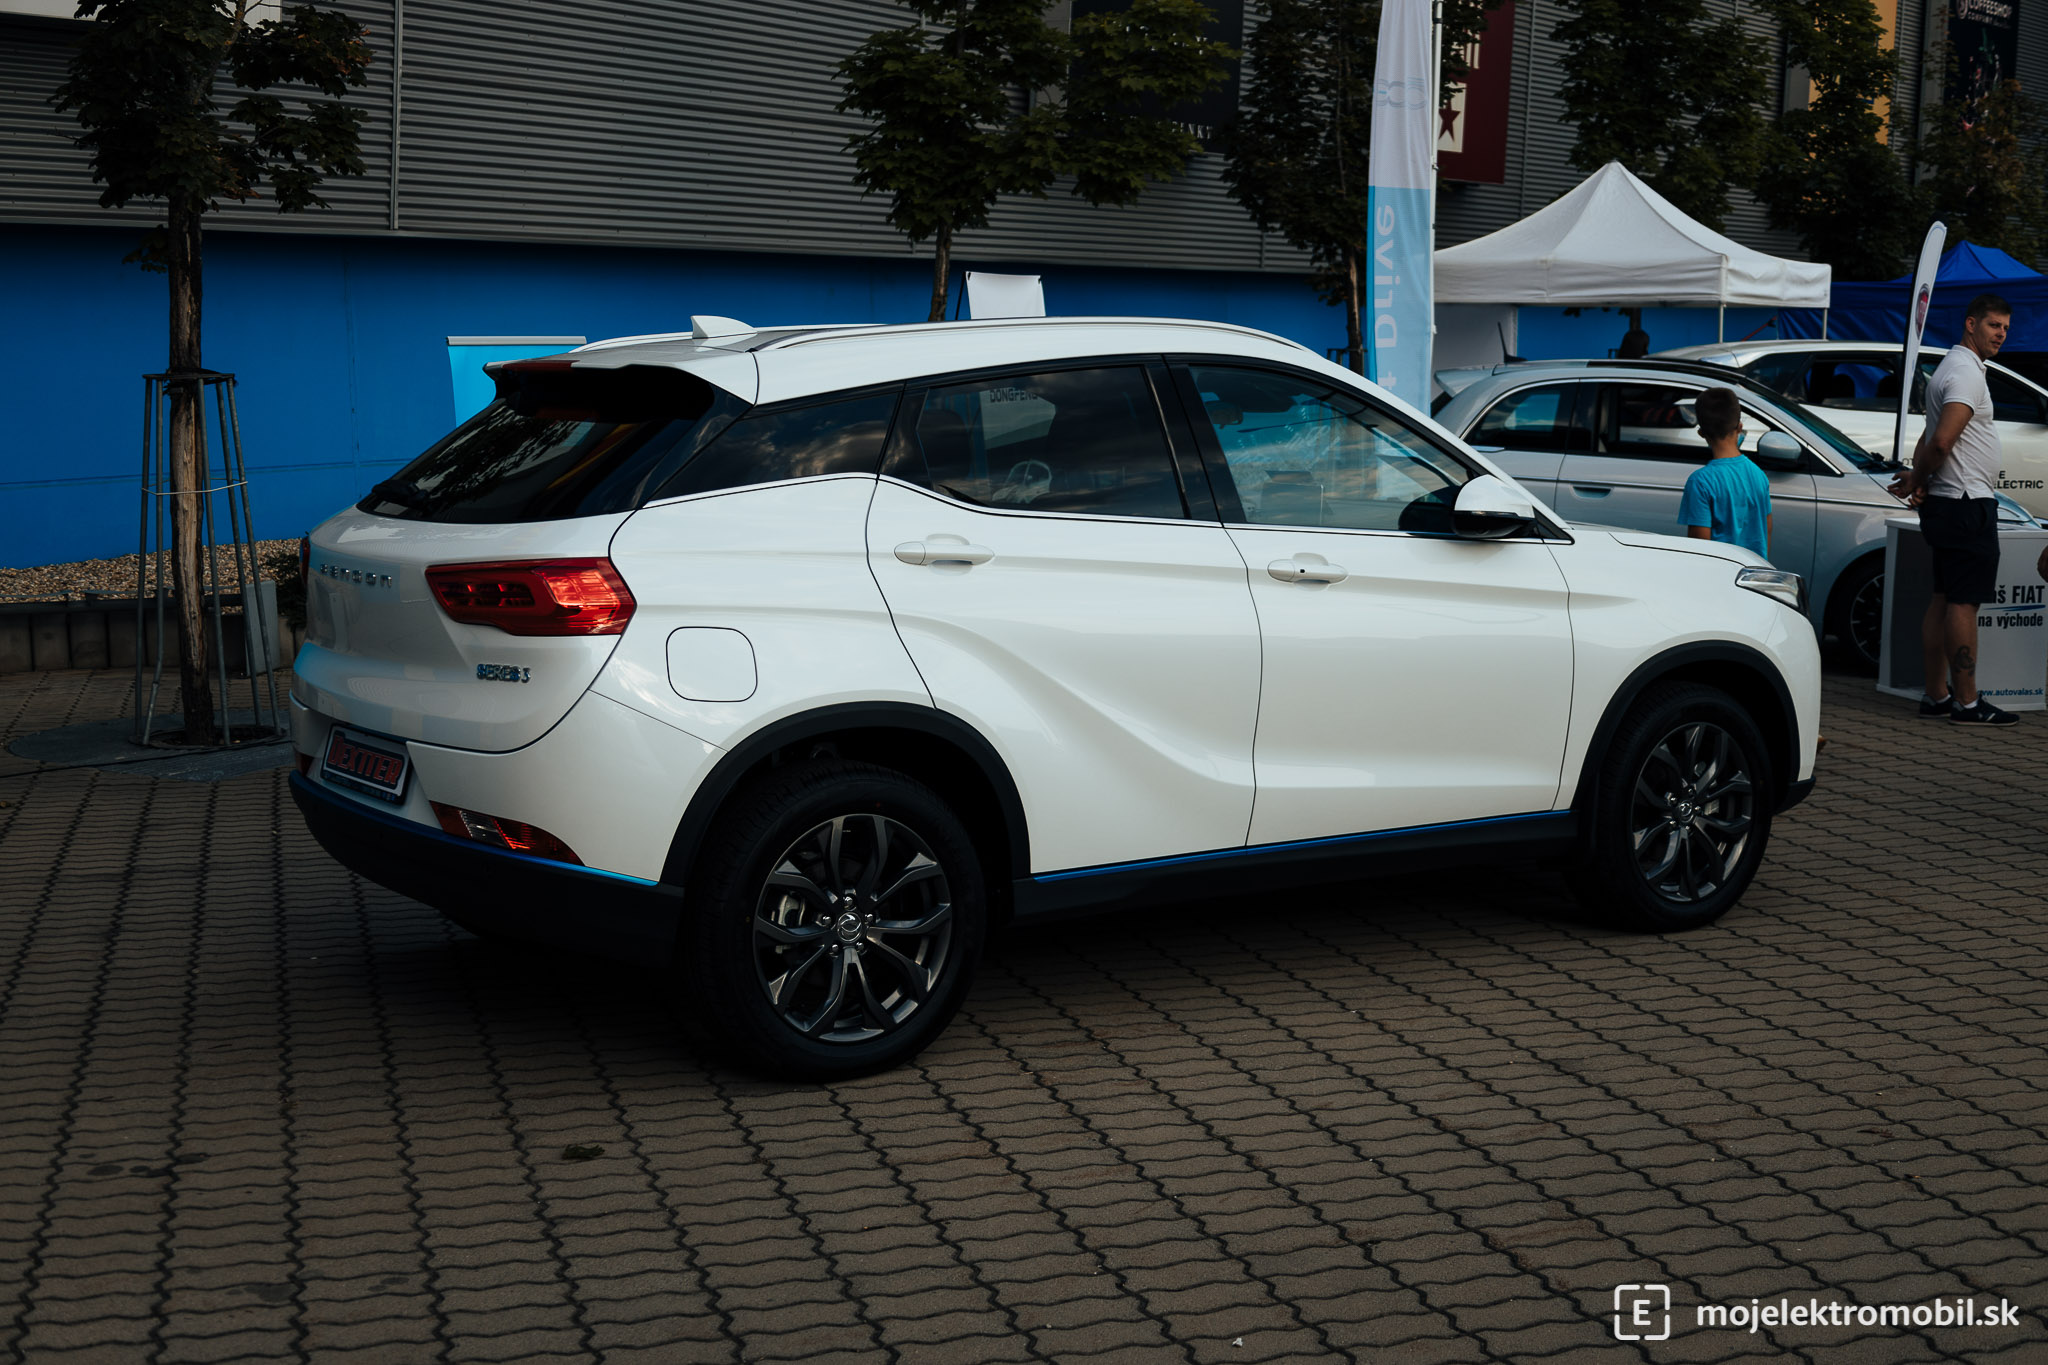 Dongfeng Salon elektromobilov 2021 Kosice